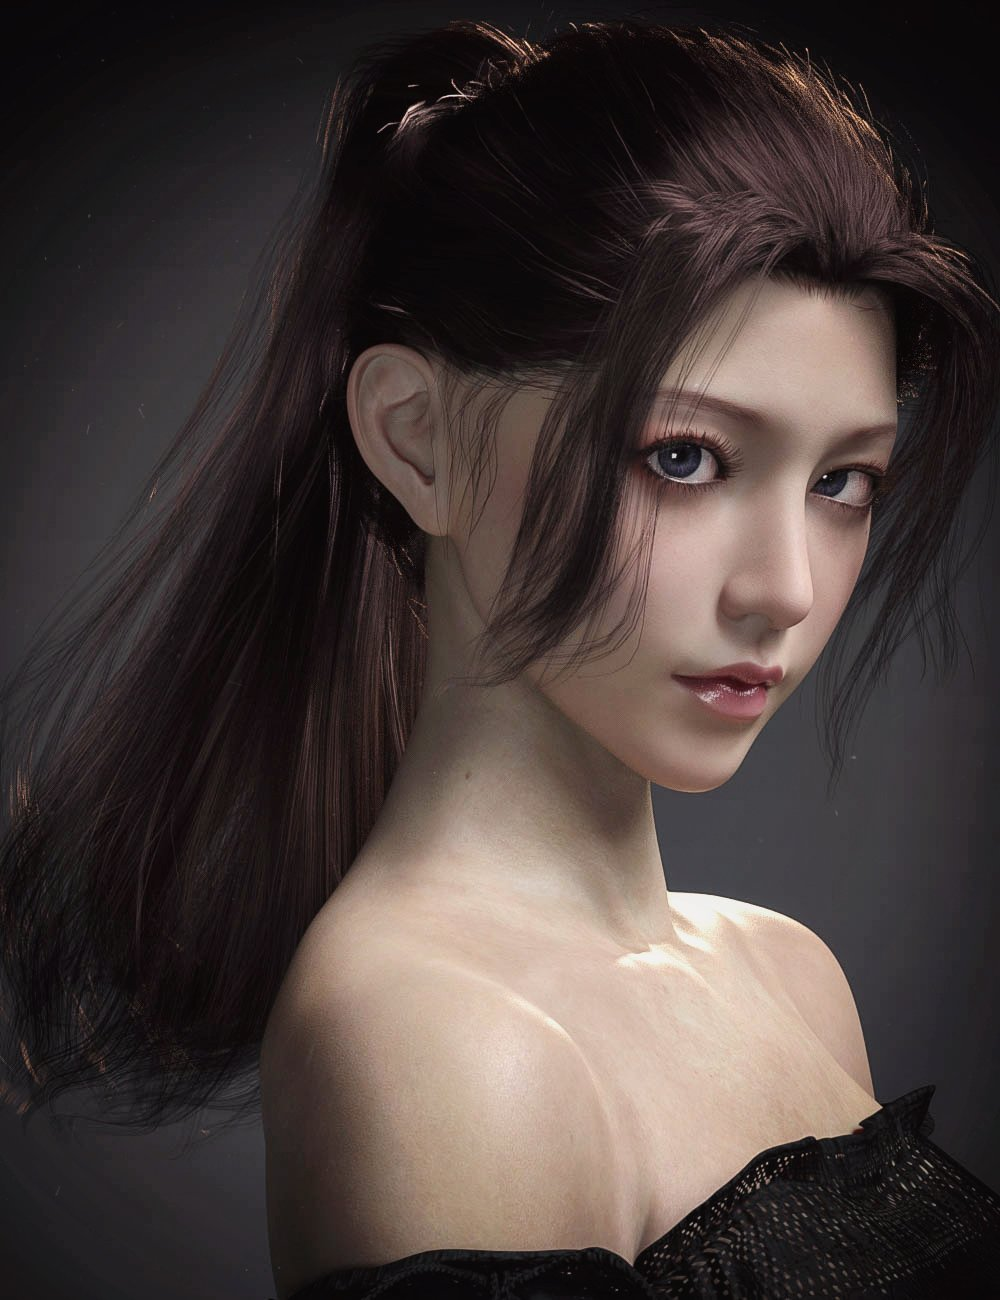 Hotba Hair for Genesis 8 and 8.1 Females by: Crocodile Liu, 3D Models by Daz 3D